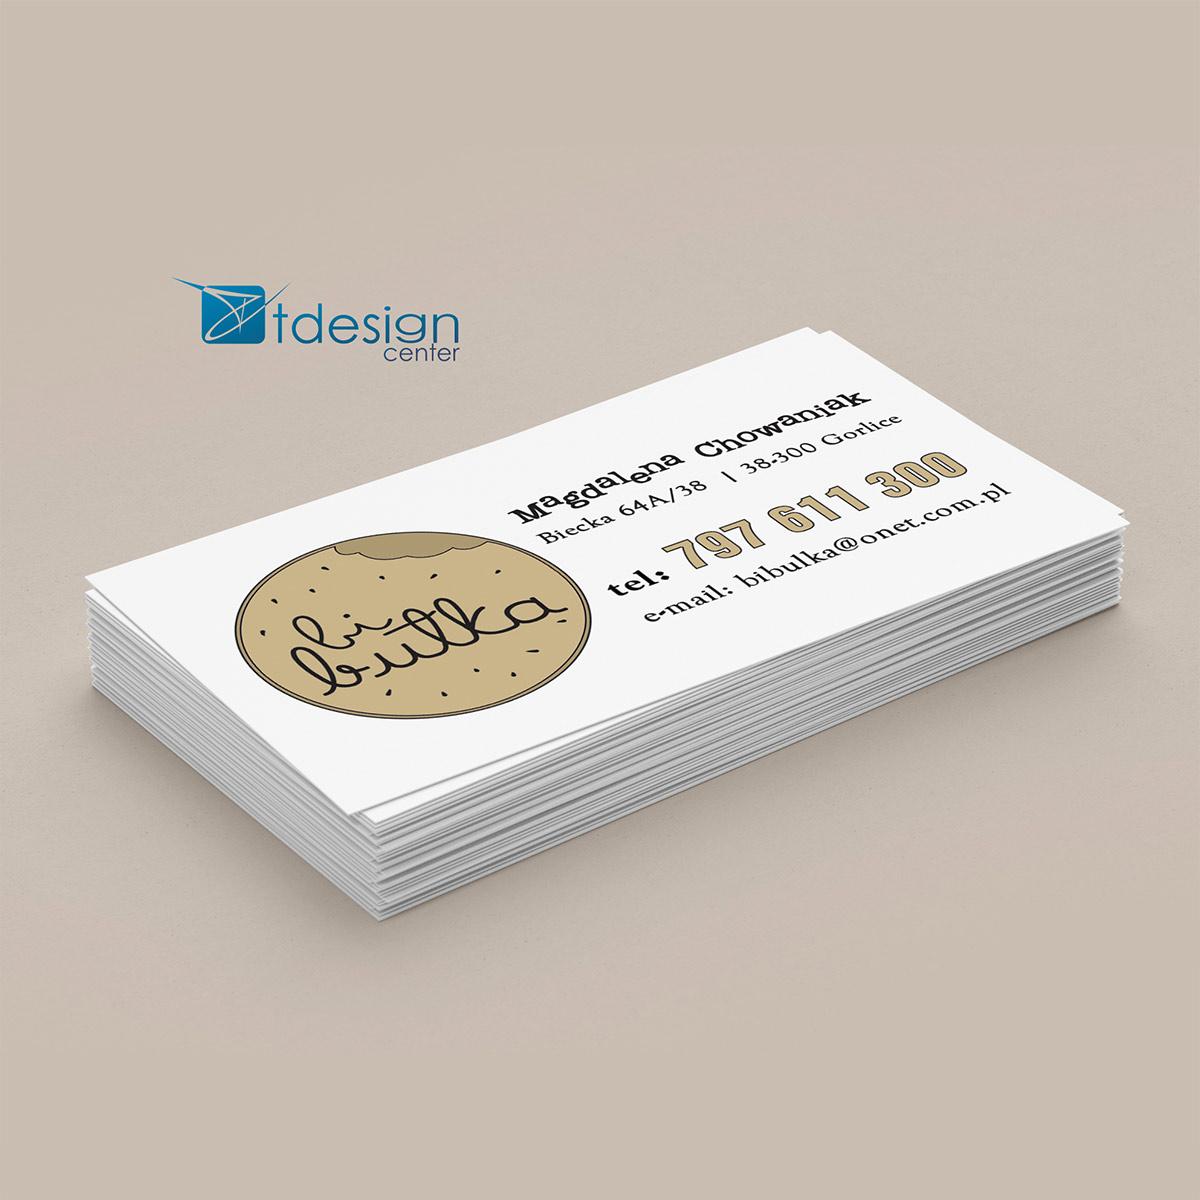 Wizytówka 90x50mm - projekt + druk